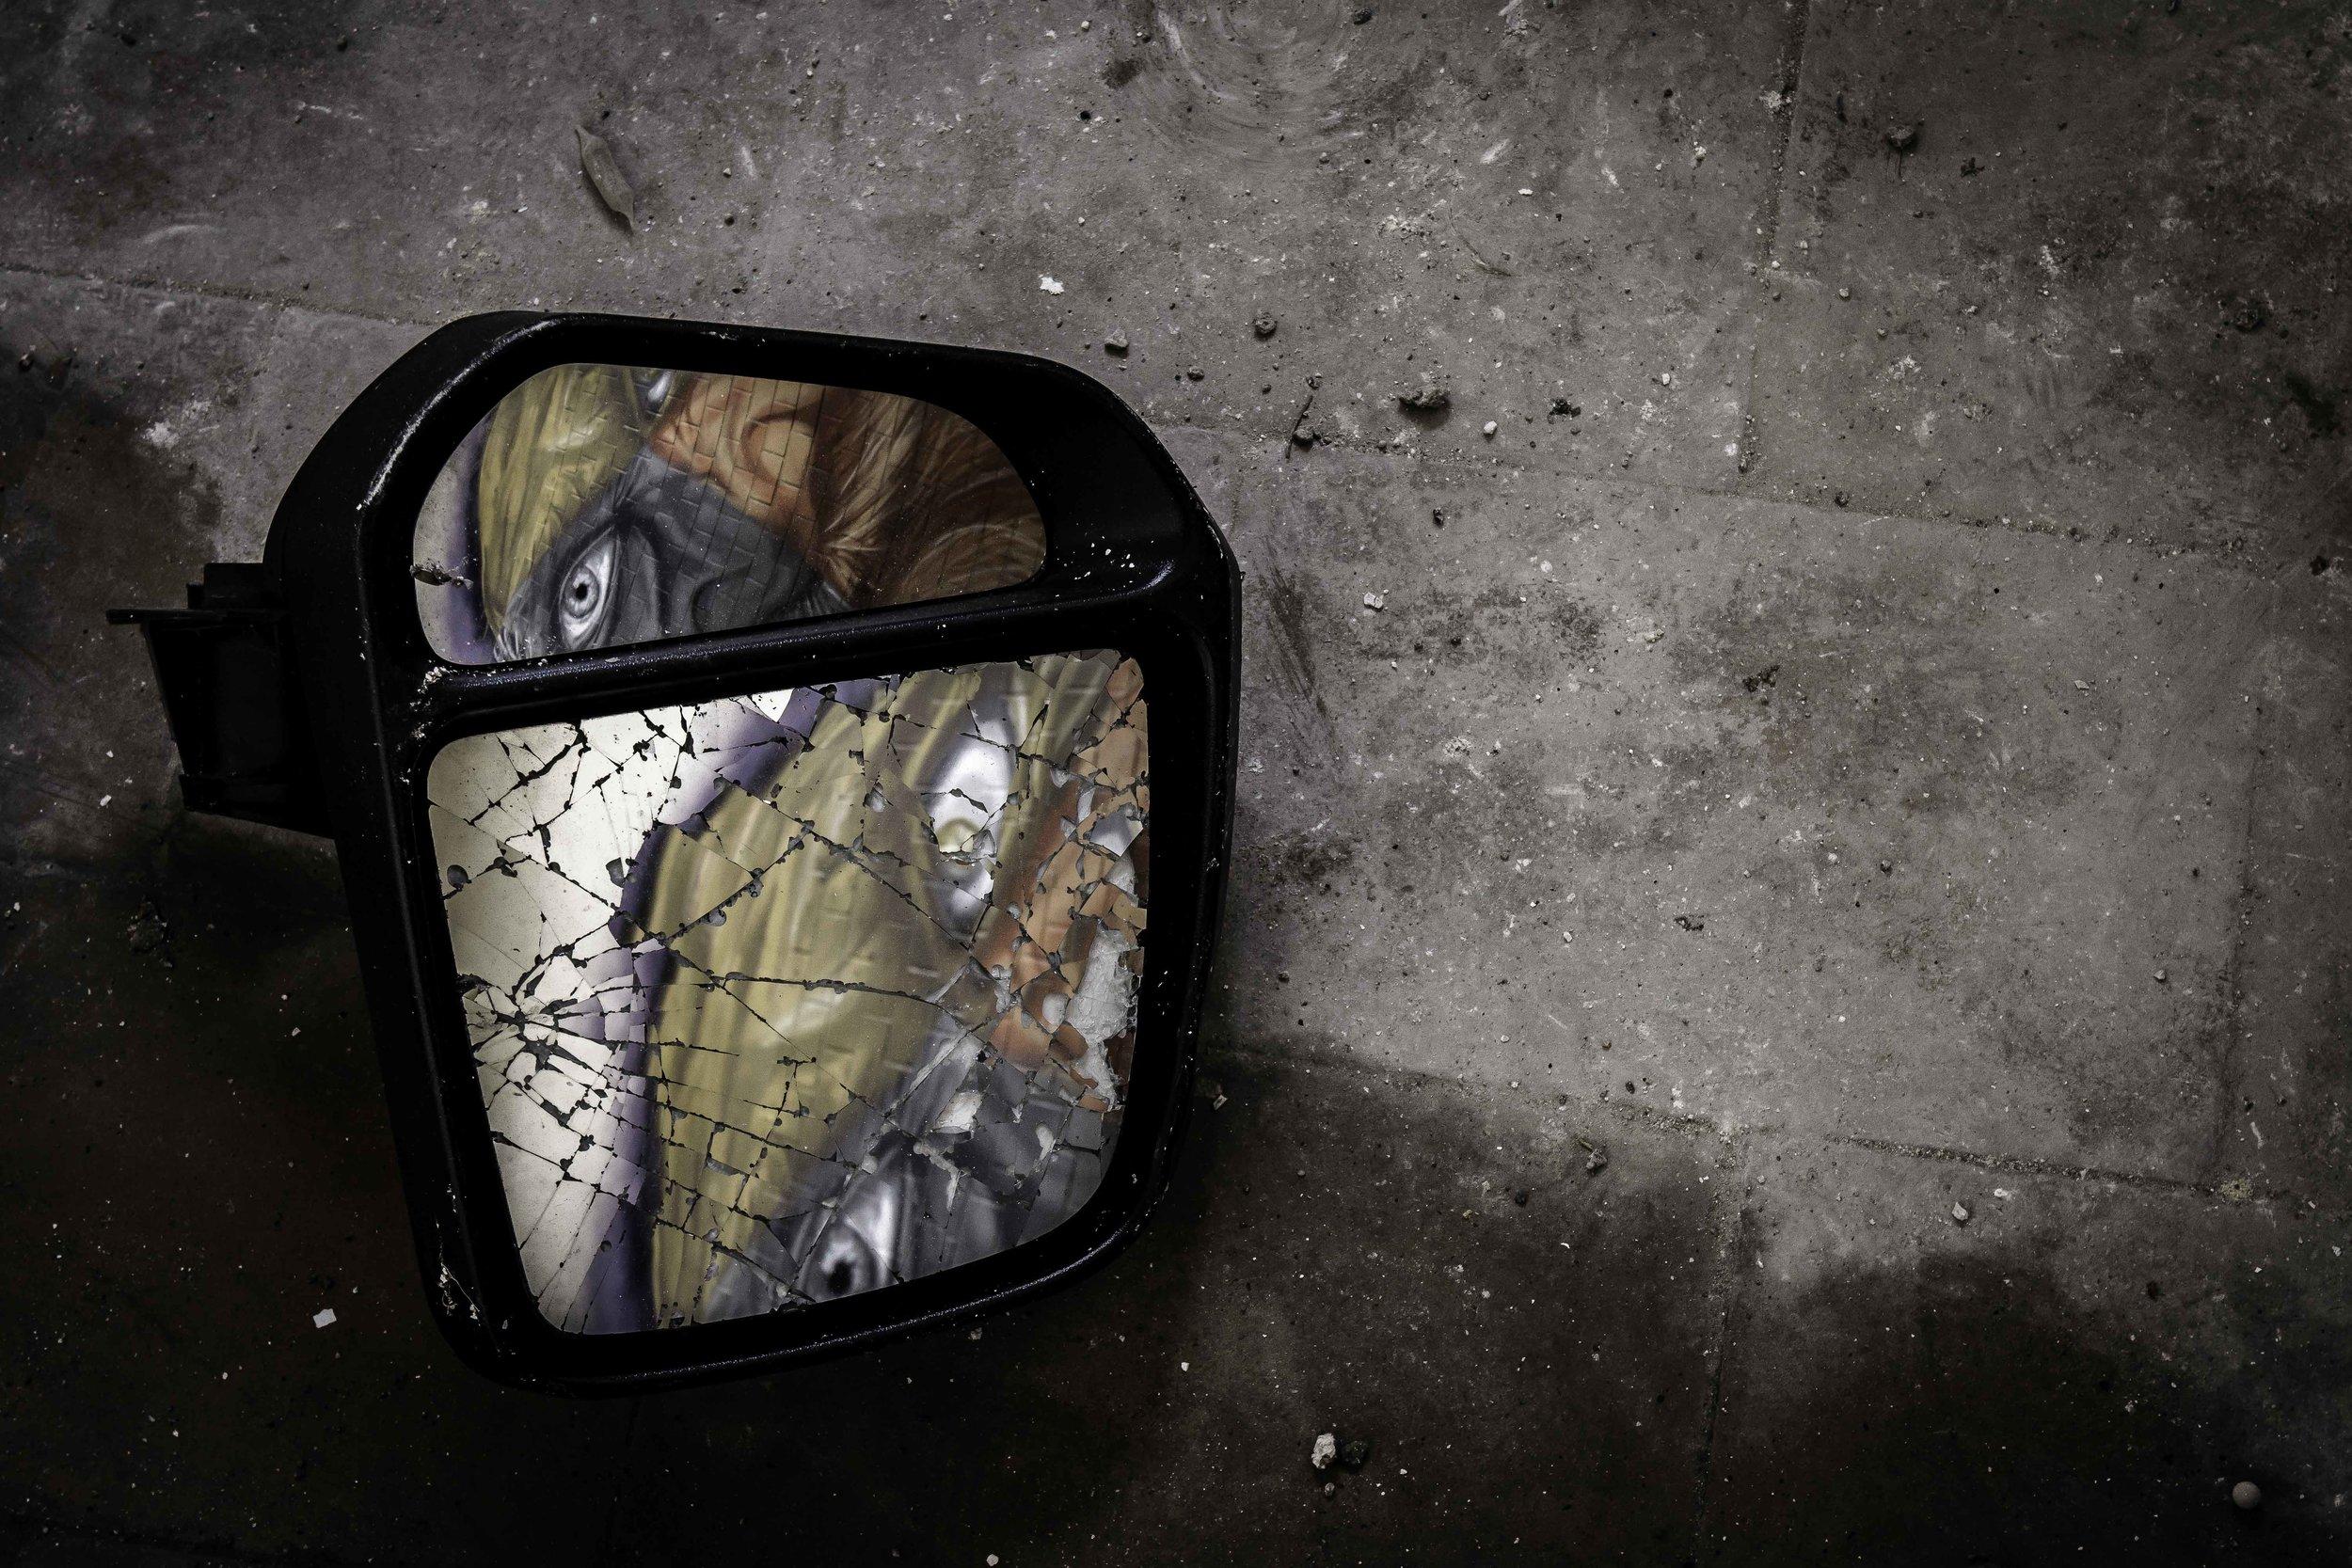 viewfinder-creativeboody-verlaten-gebouwen-fotograferen-buurt-bastogne-vroeger-opleidingscentrum-SNCB-urbex-fotografie-belgie-3